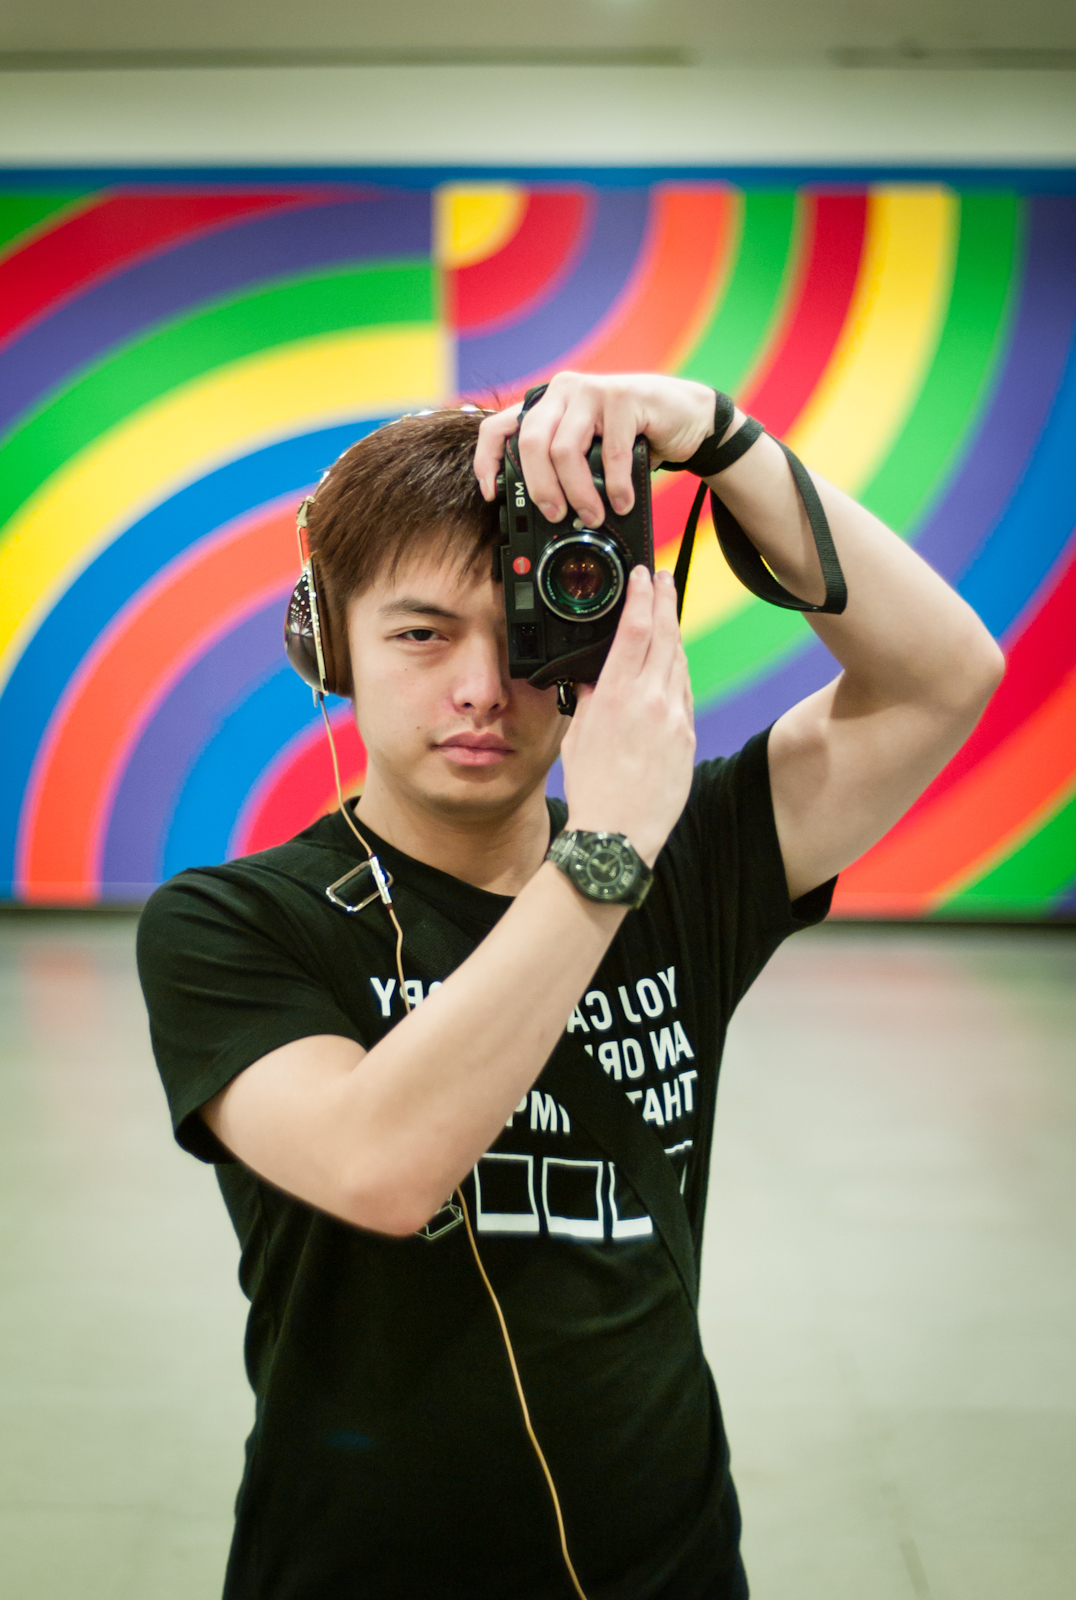 Self portrait of photographer Jen Xi